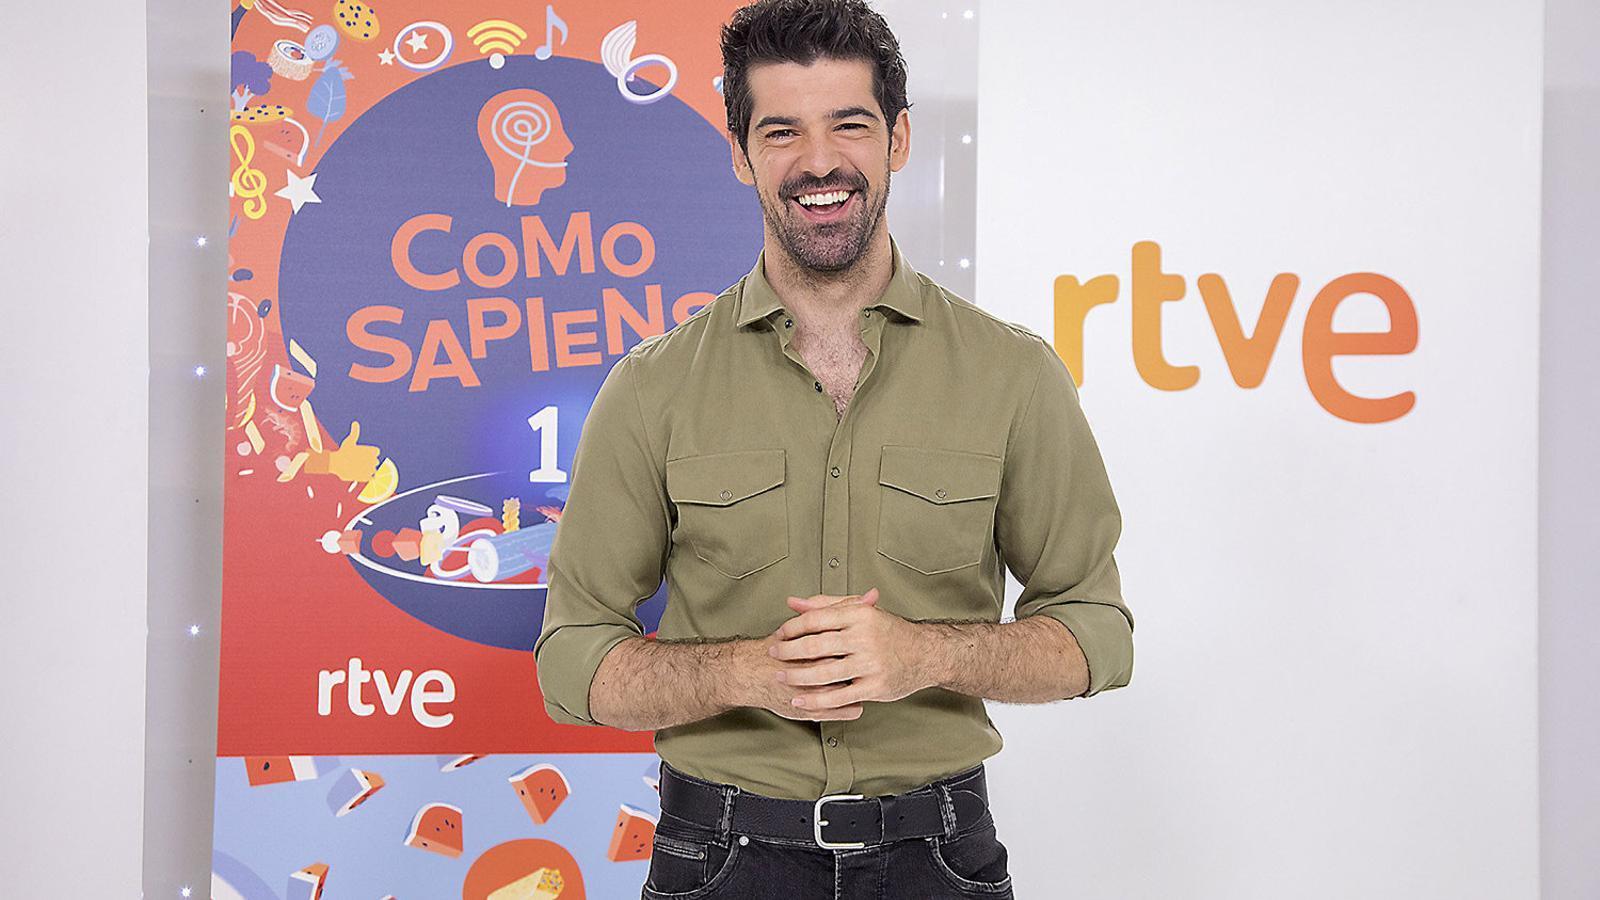 Miguel Ángel Muñoz presentarà Como sapiens, que s'emetrà a La 1 cada migdia a partir d'avui.